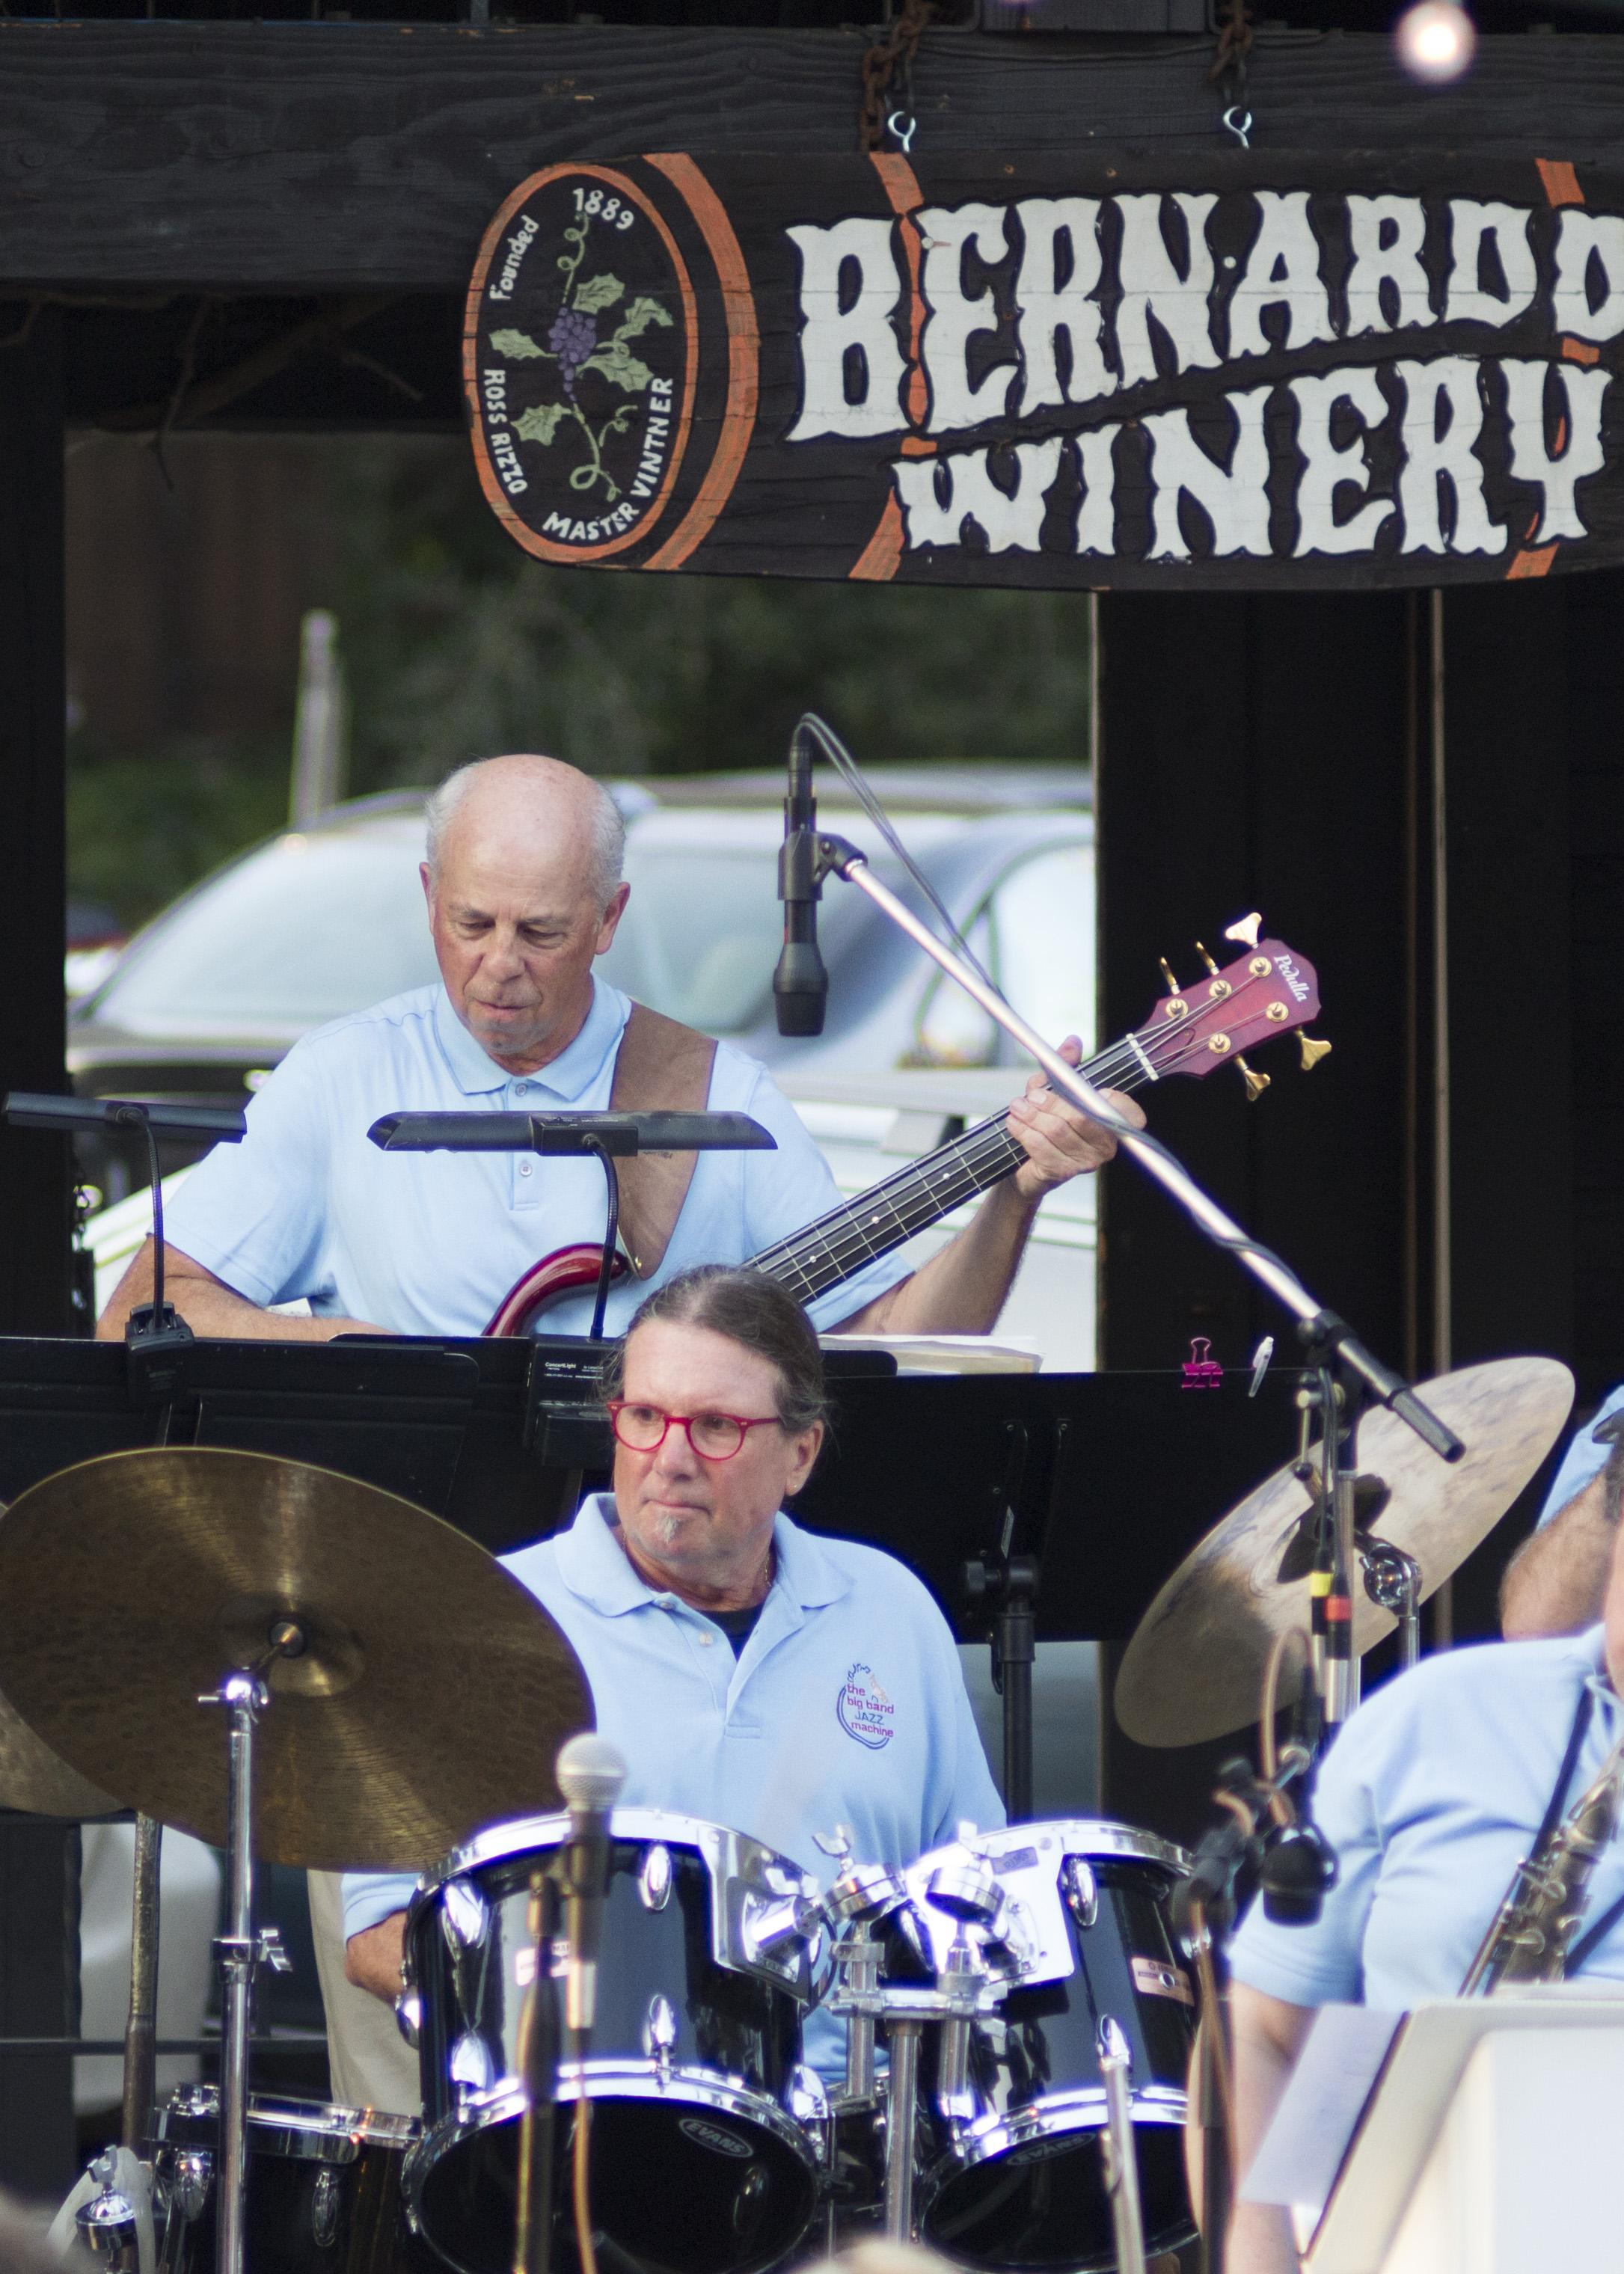 Bernardo Winery August 2016